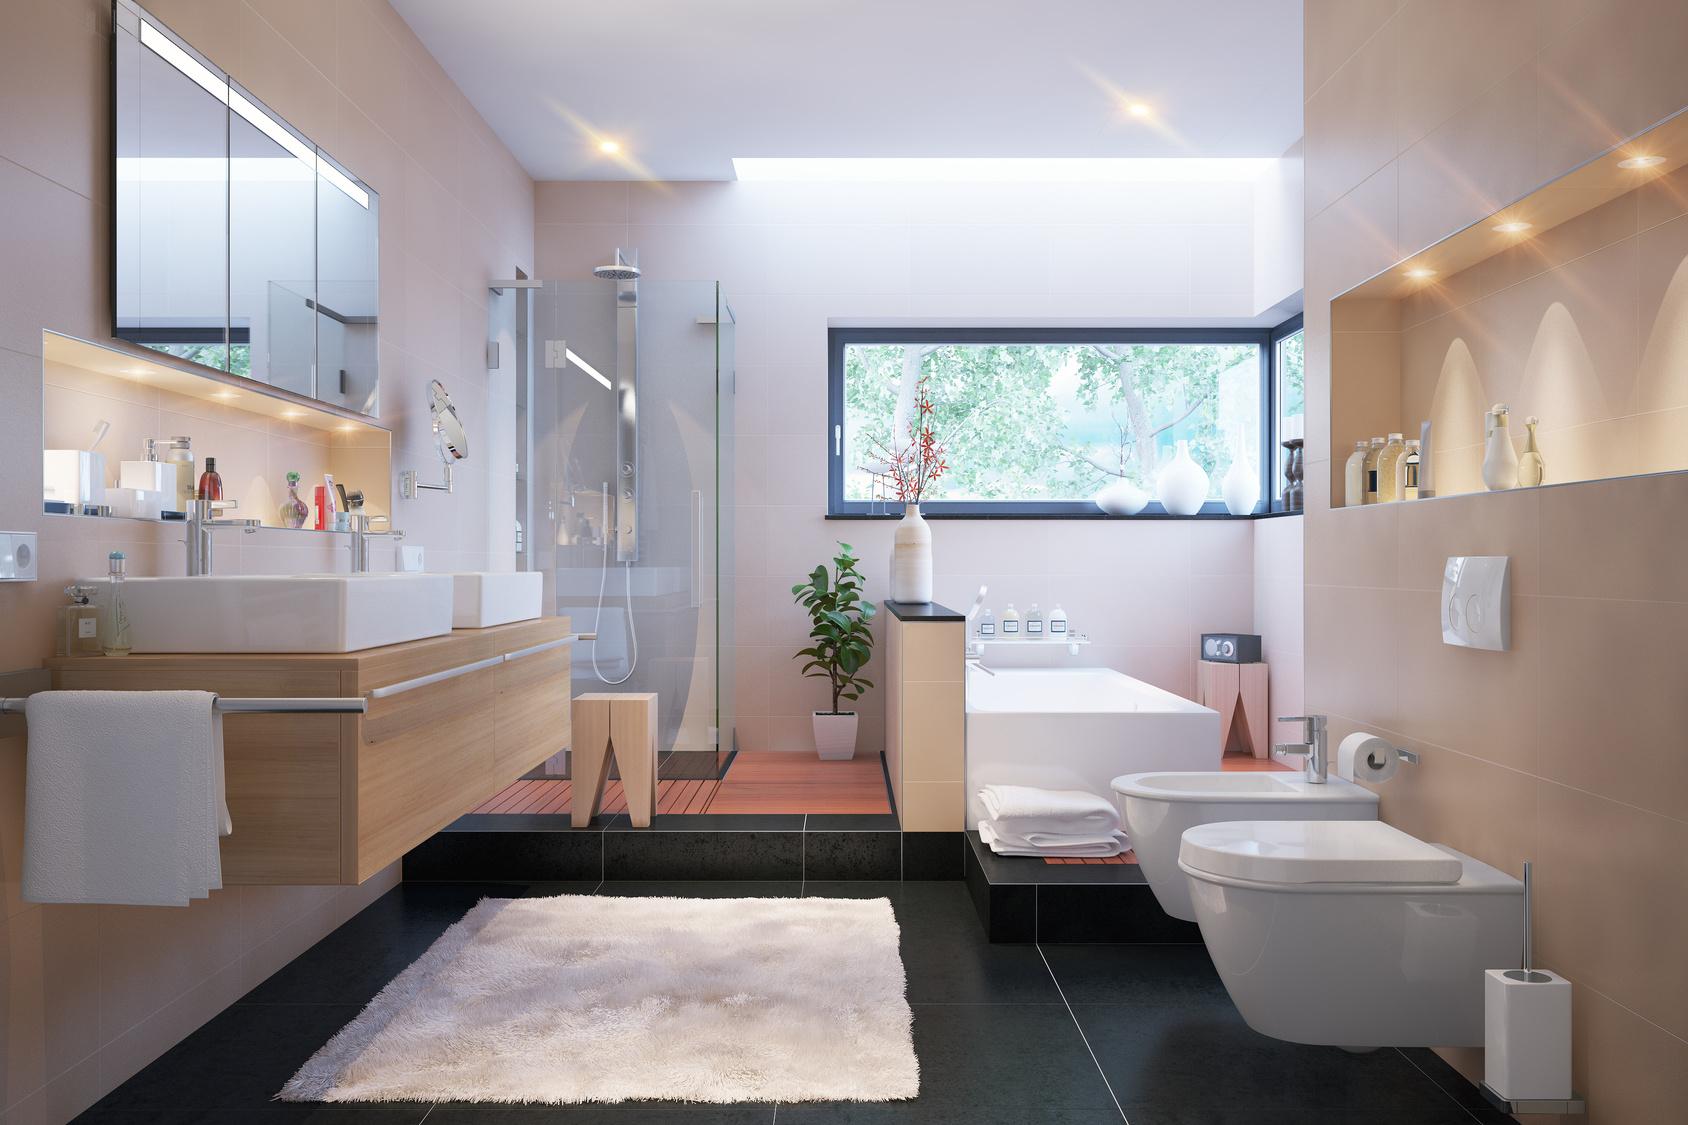 Carrelage Sol Salle De Bain Gris Anthracite choisir un carrelage au sol pour salle de bain